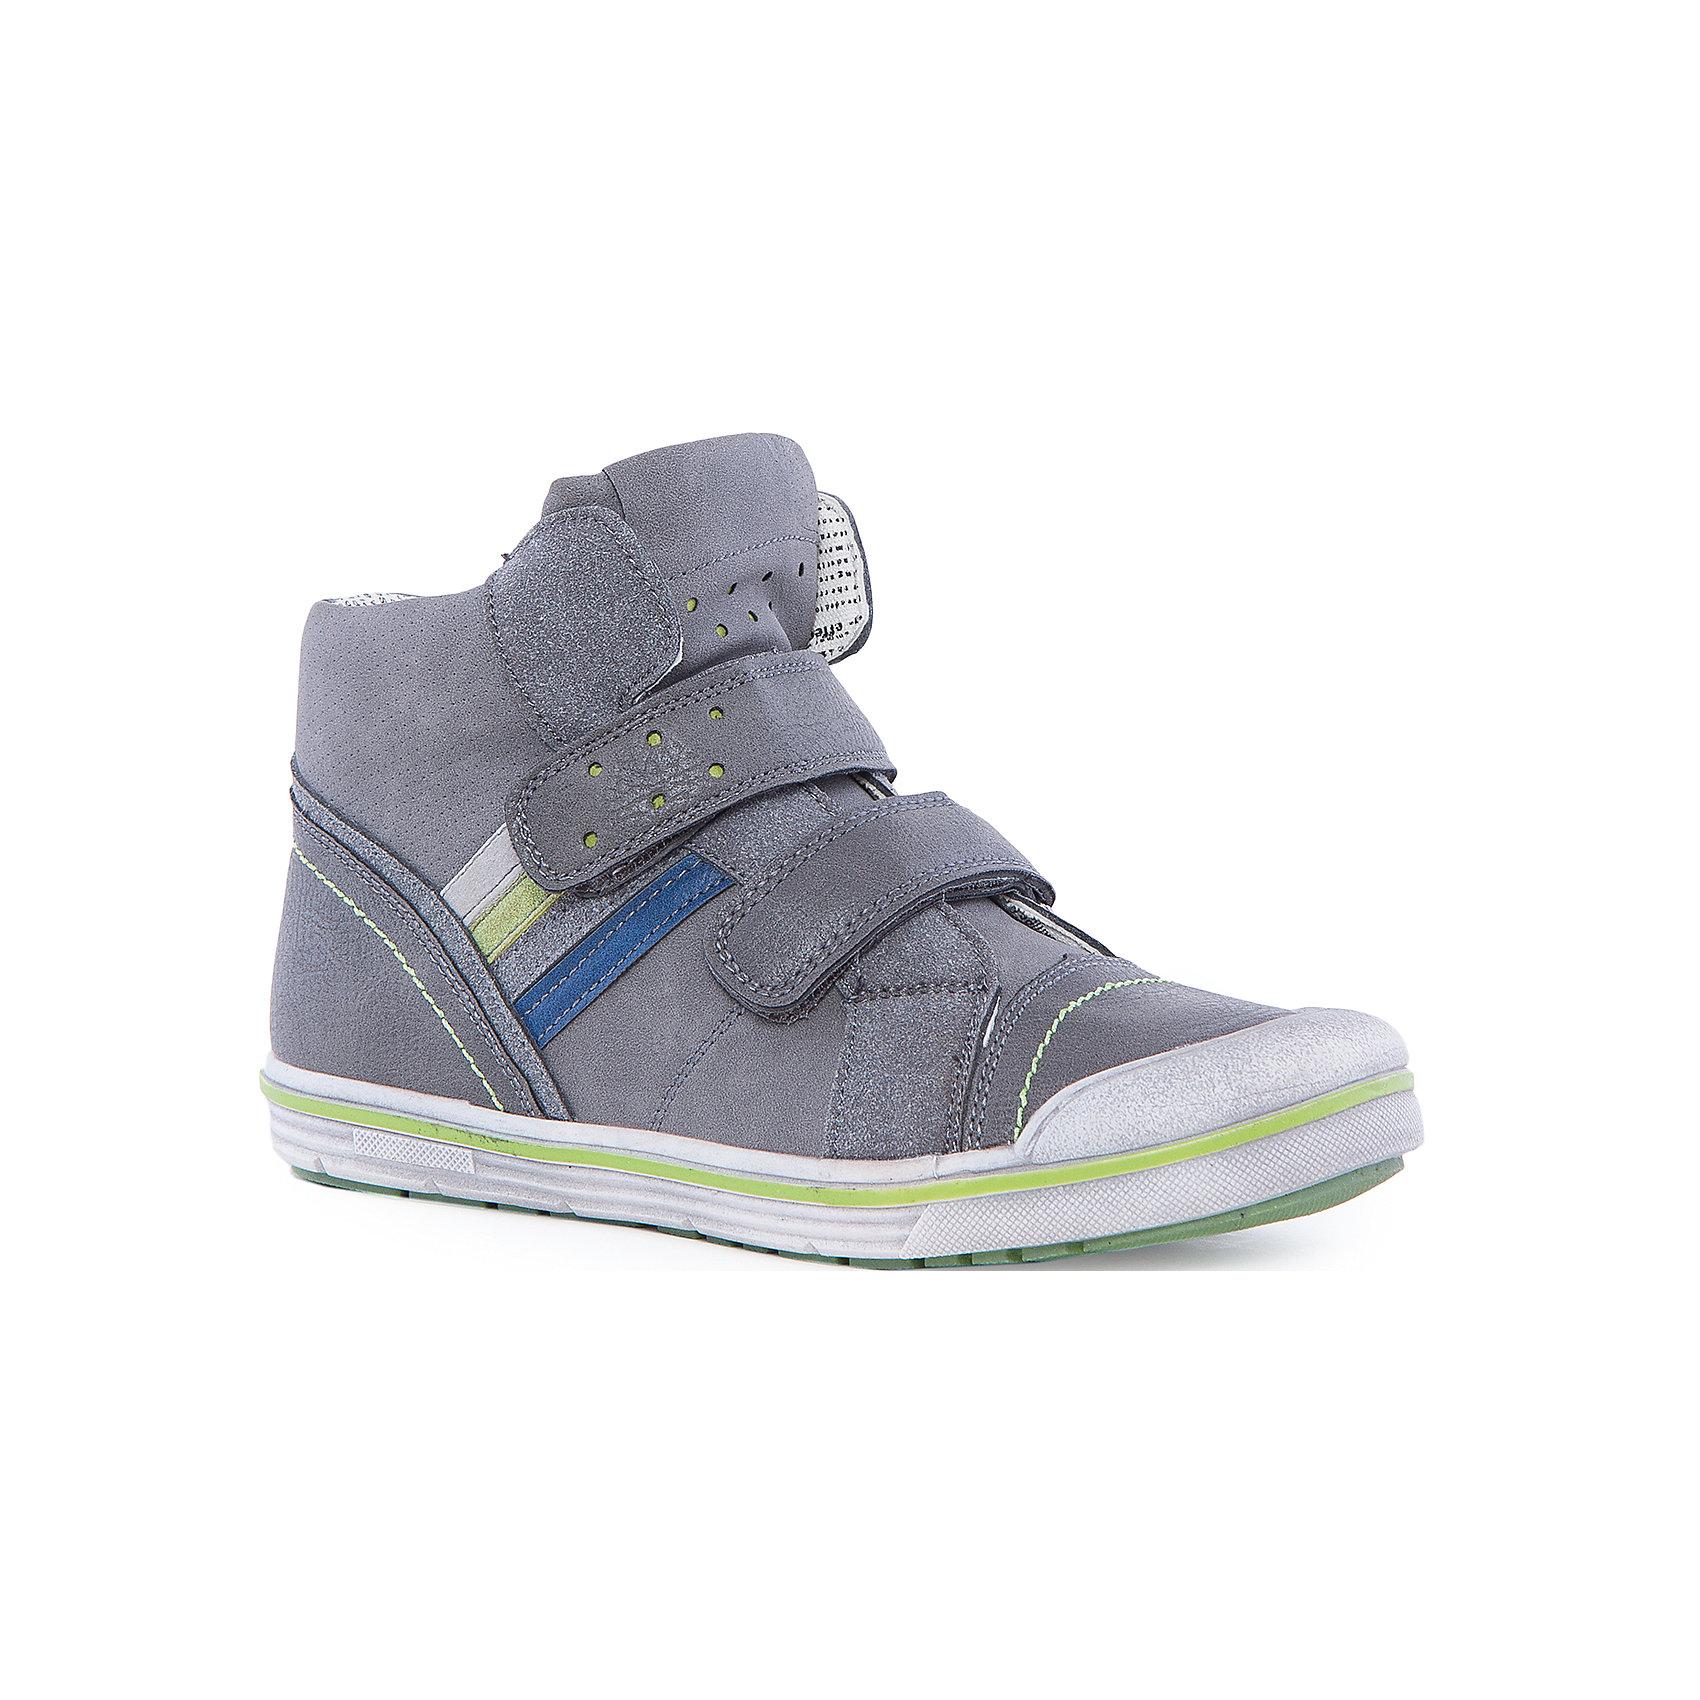 Ботинки для мальчика S'cool